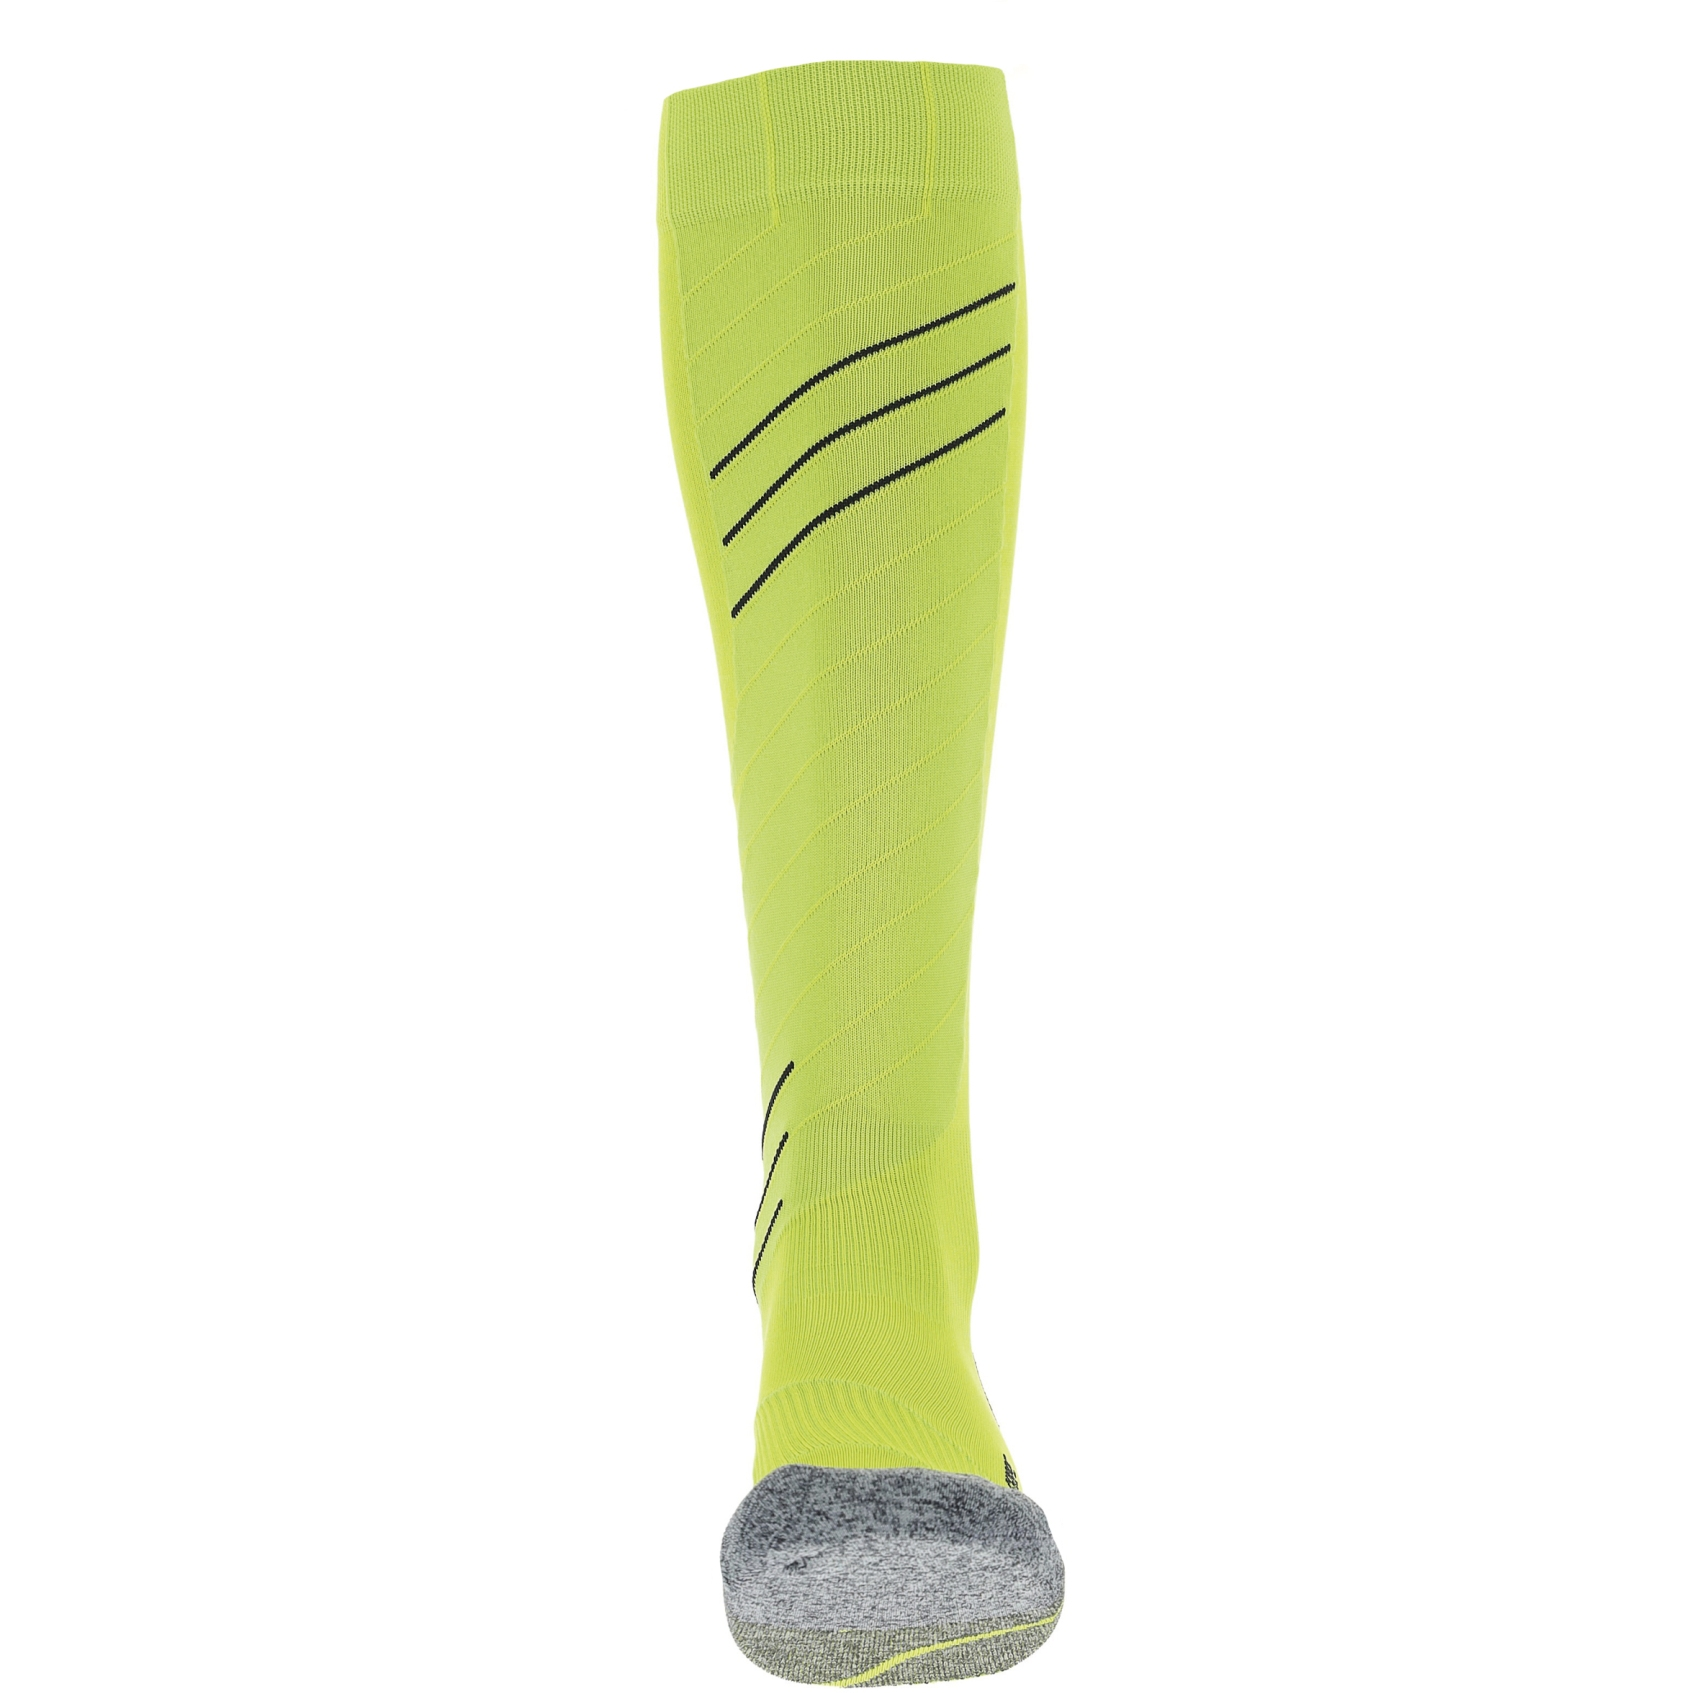 Image of UYN Ski Race Shape Socks - Lime